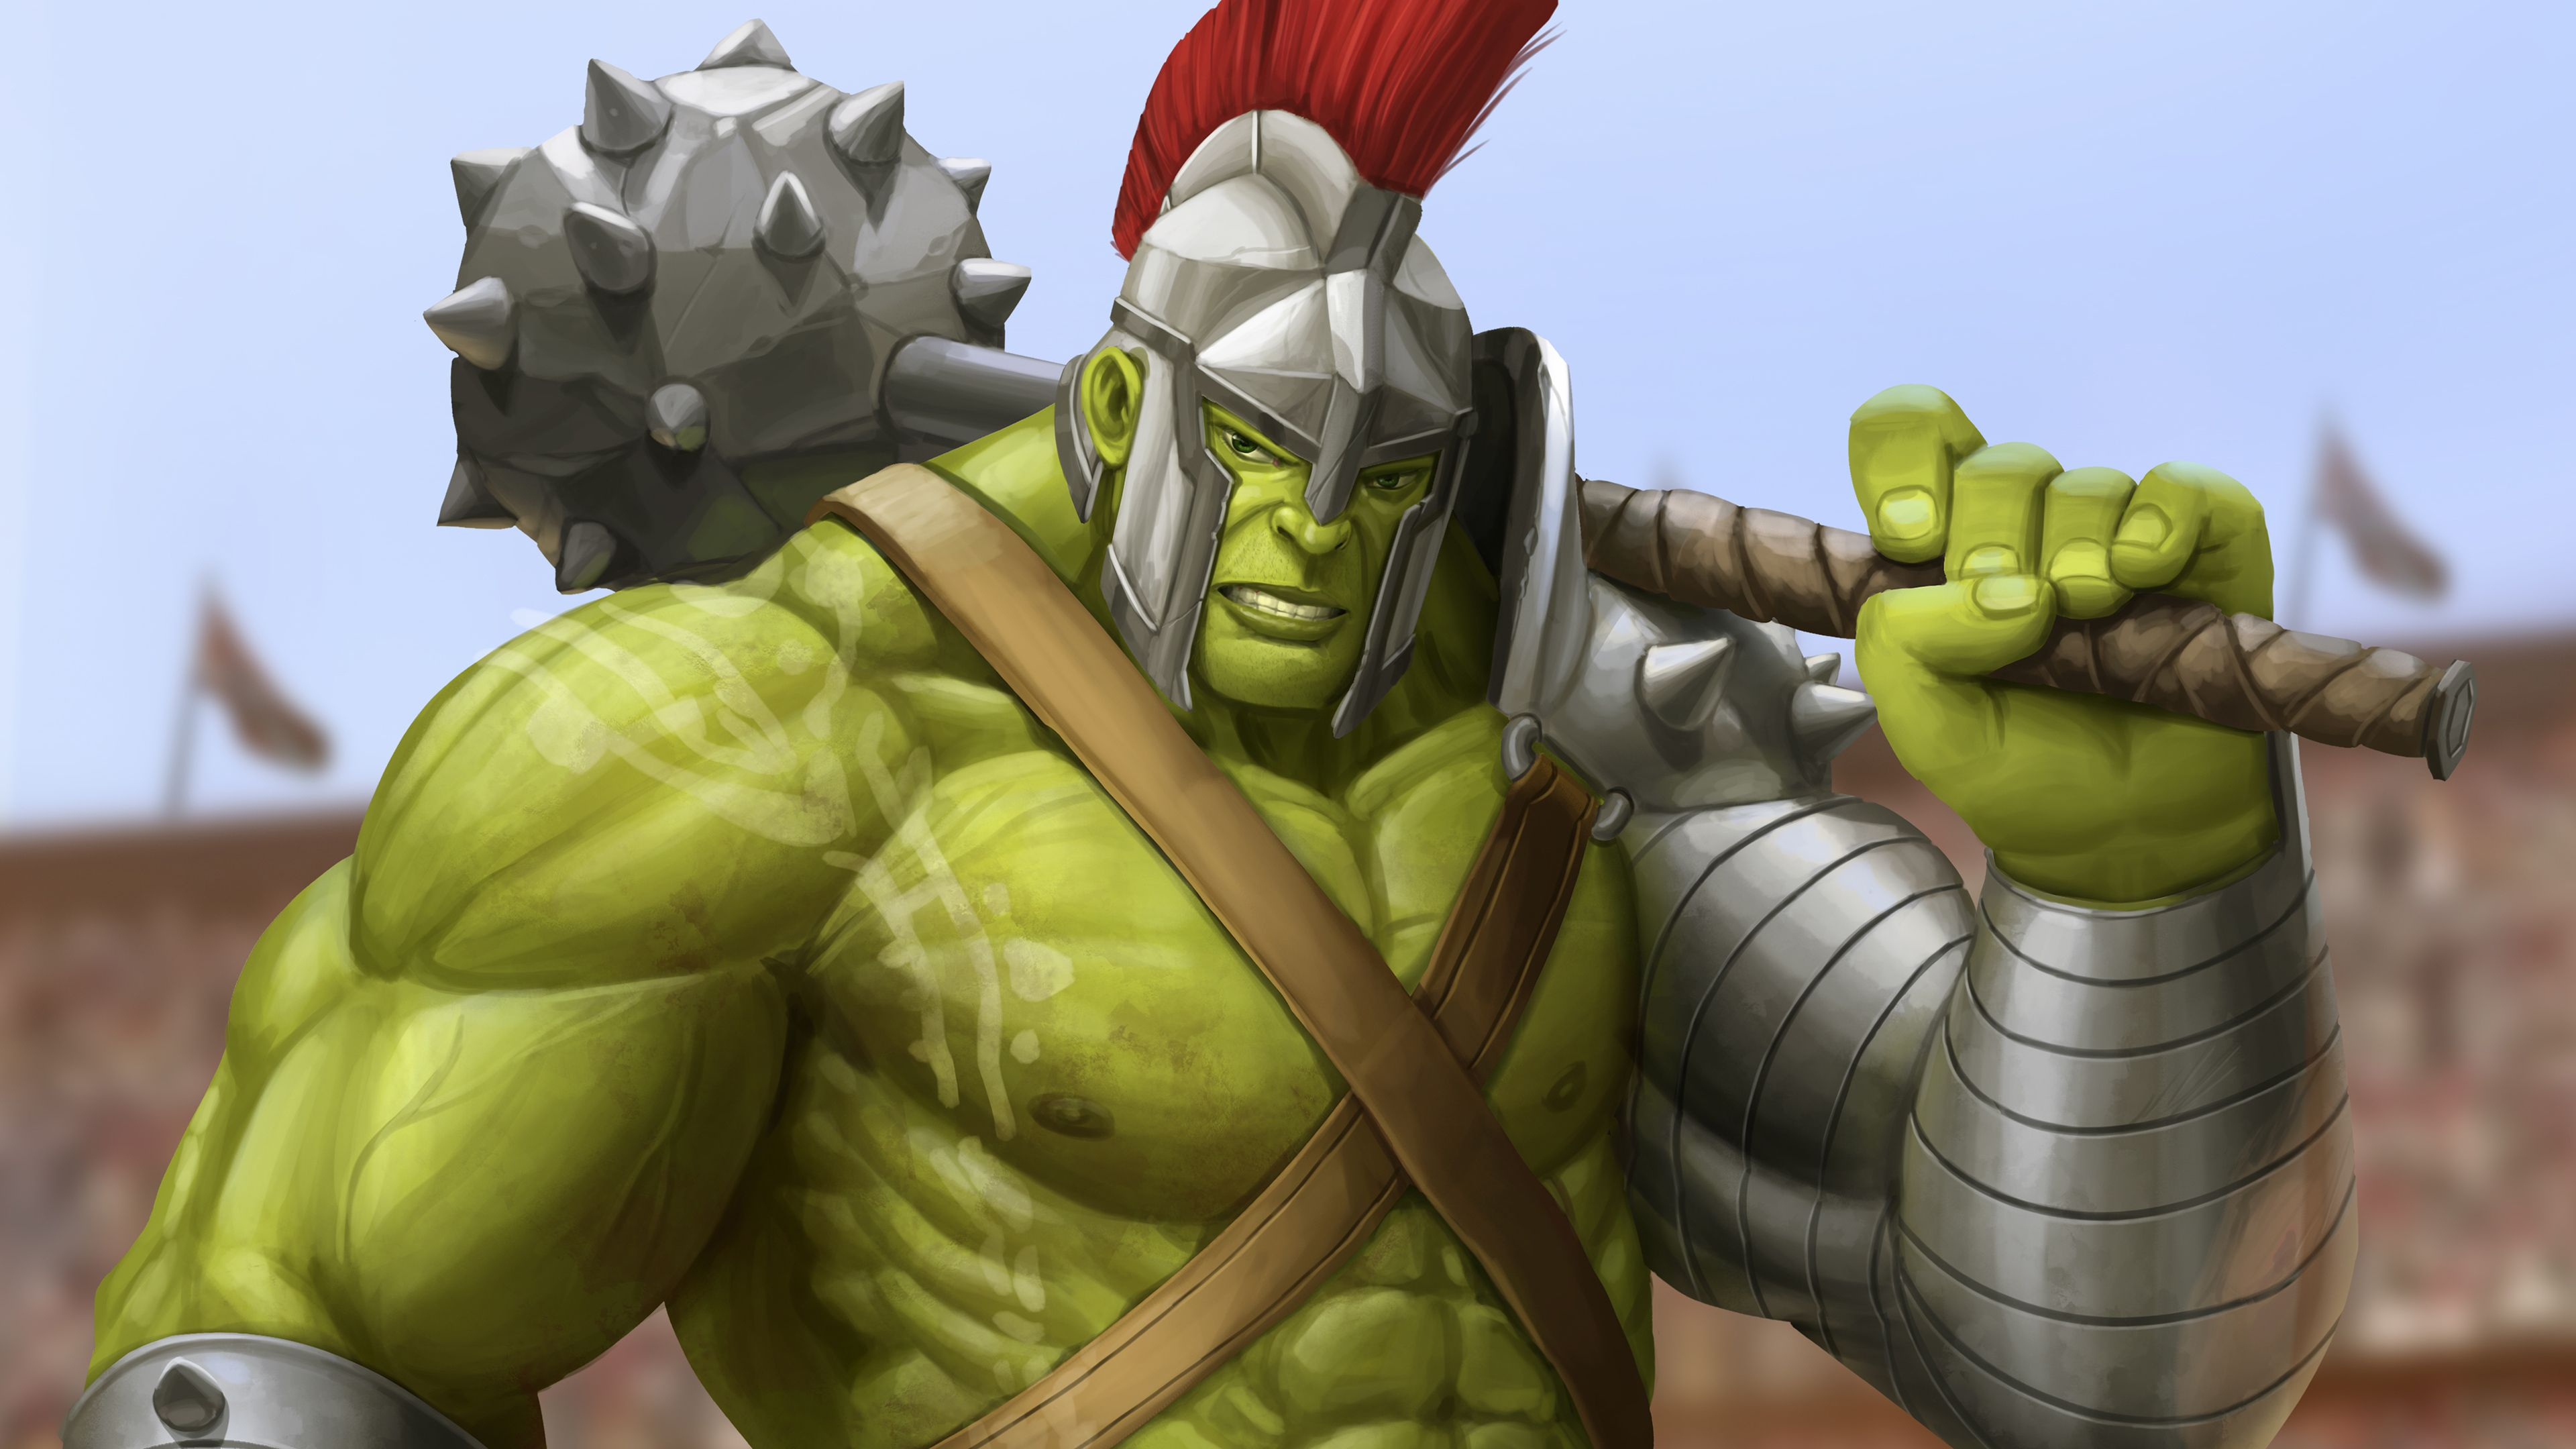 Hulk 4k Art superheroes wallpapers, hulk wallpapers, hd